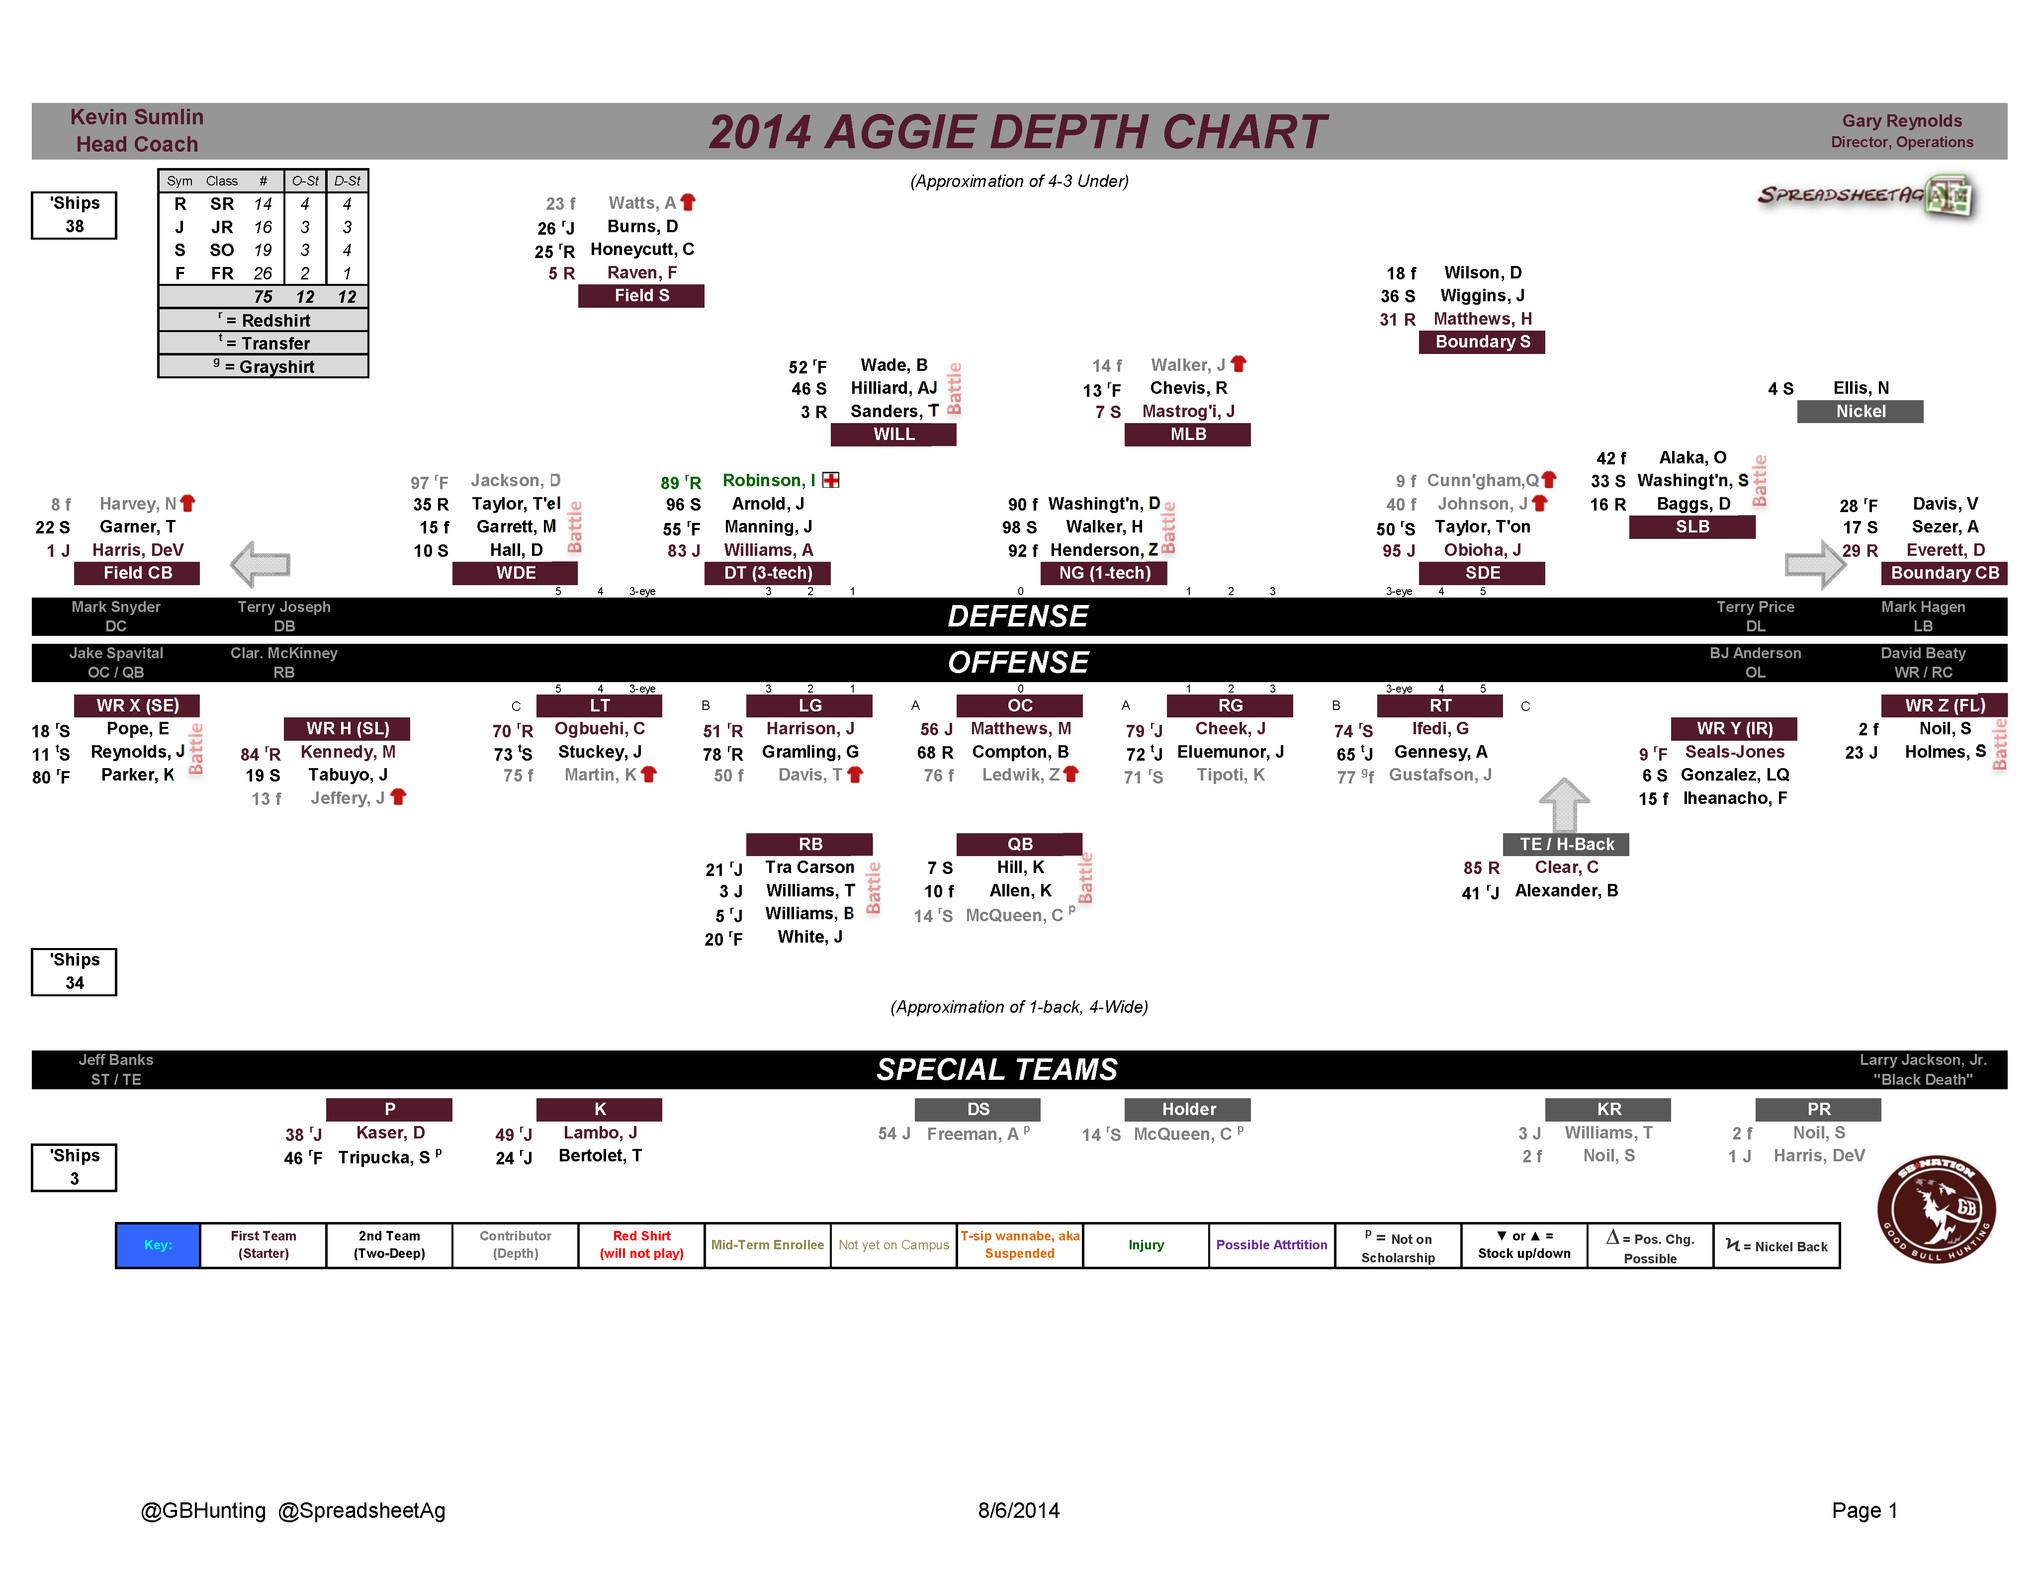 Football Depth Chart Templates Texas A&m Football 2014 Depth Chart Good Bull Hunting